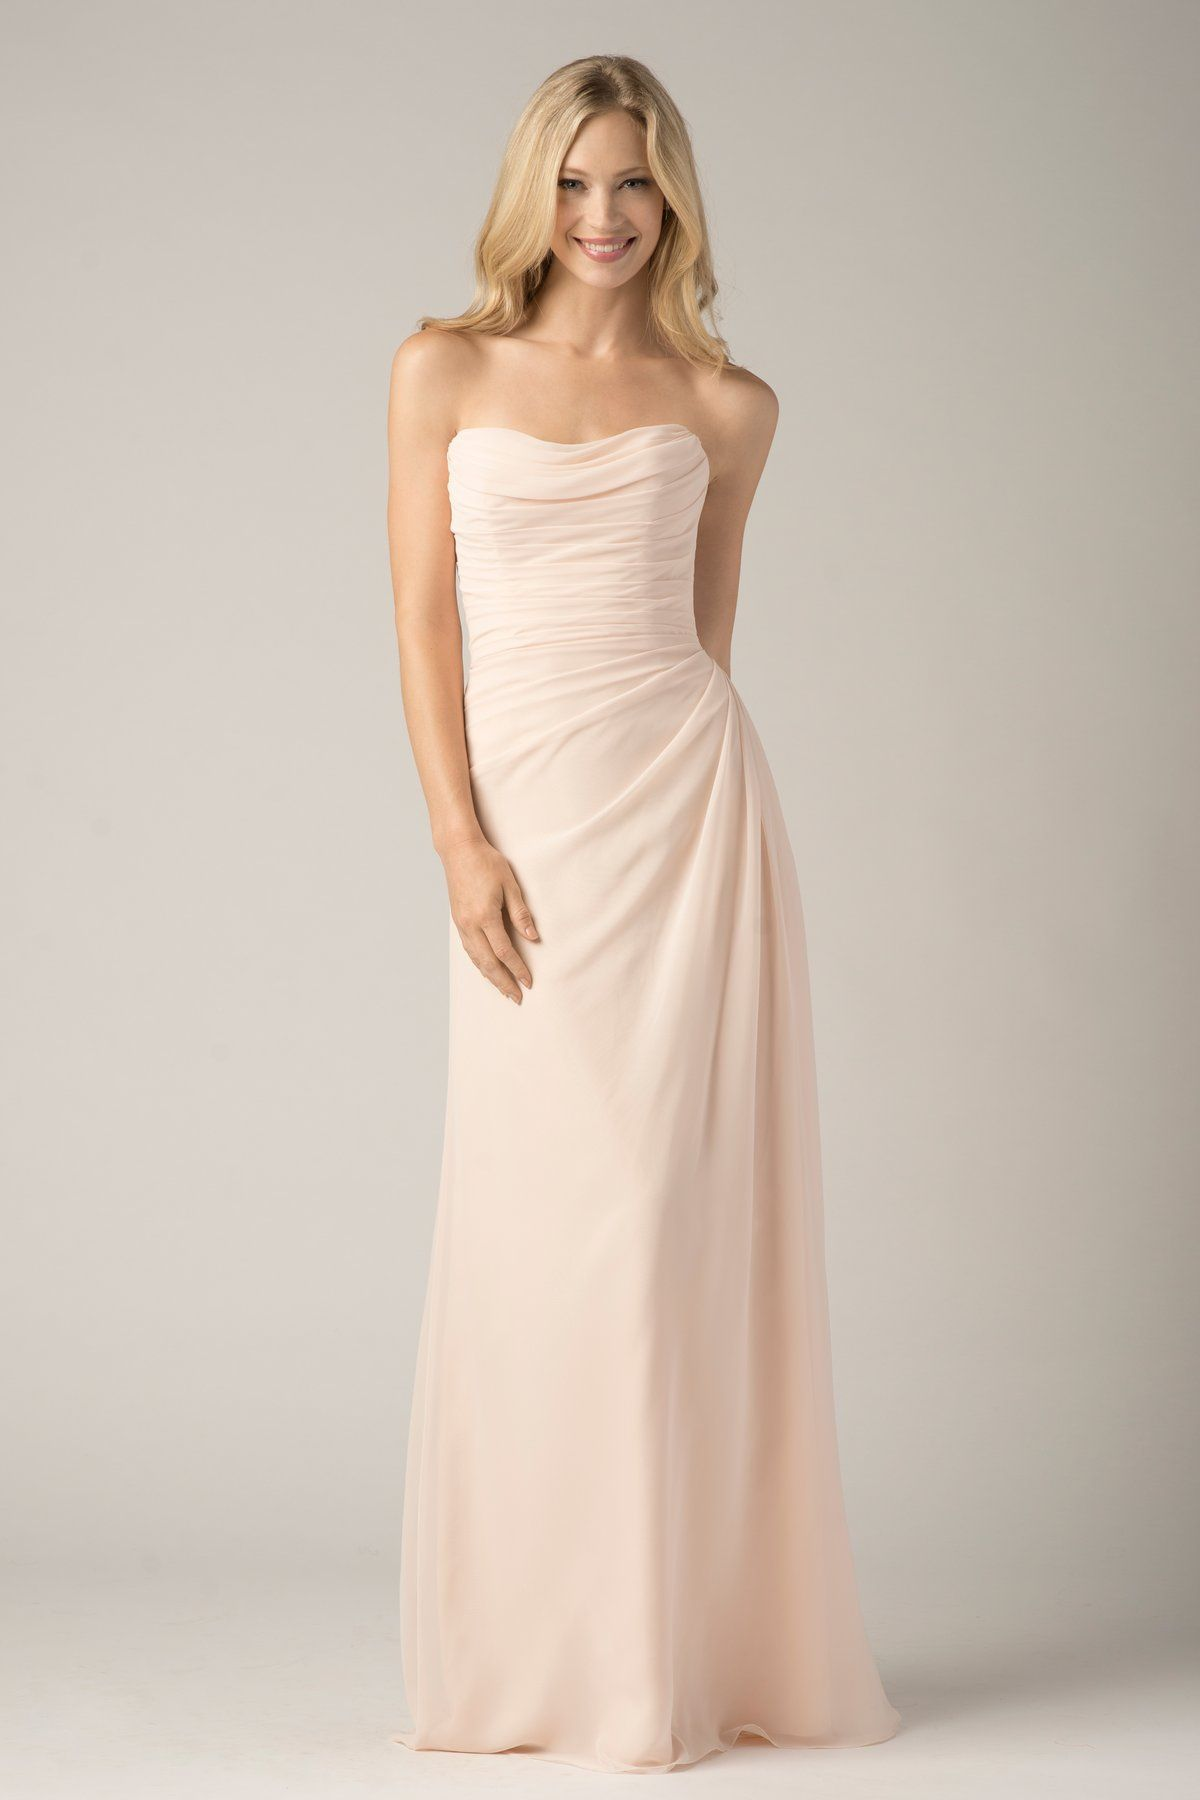 Wtoo maids dress bridesmaid dresses pinterest other